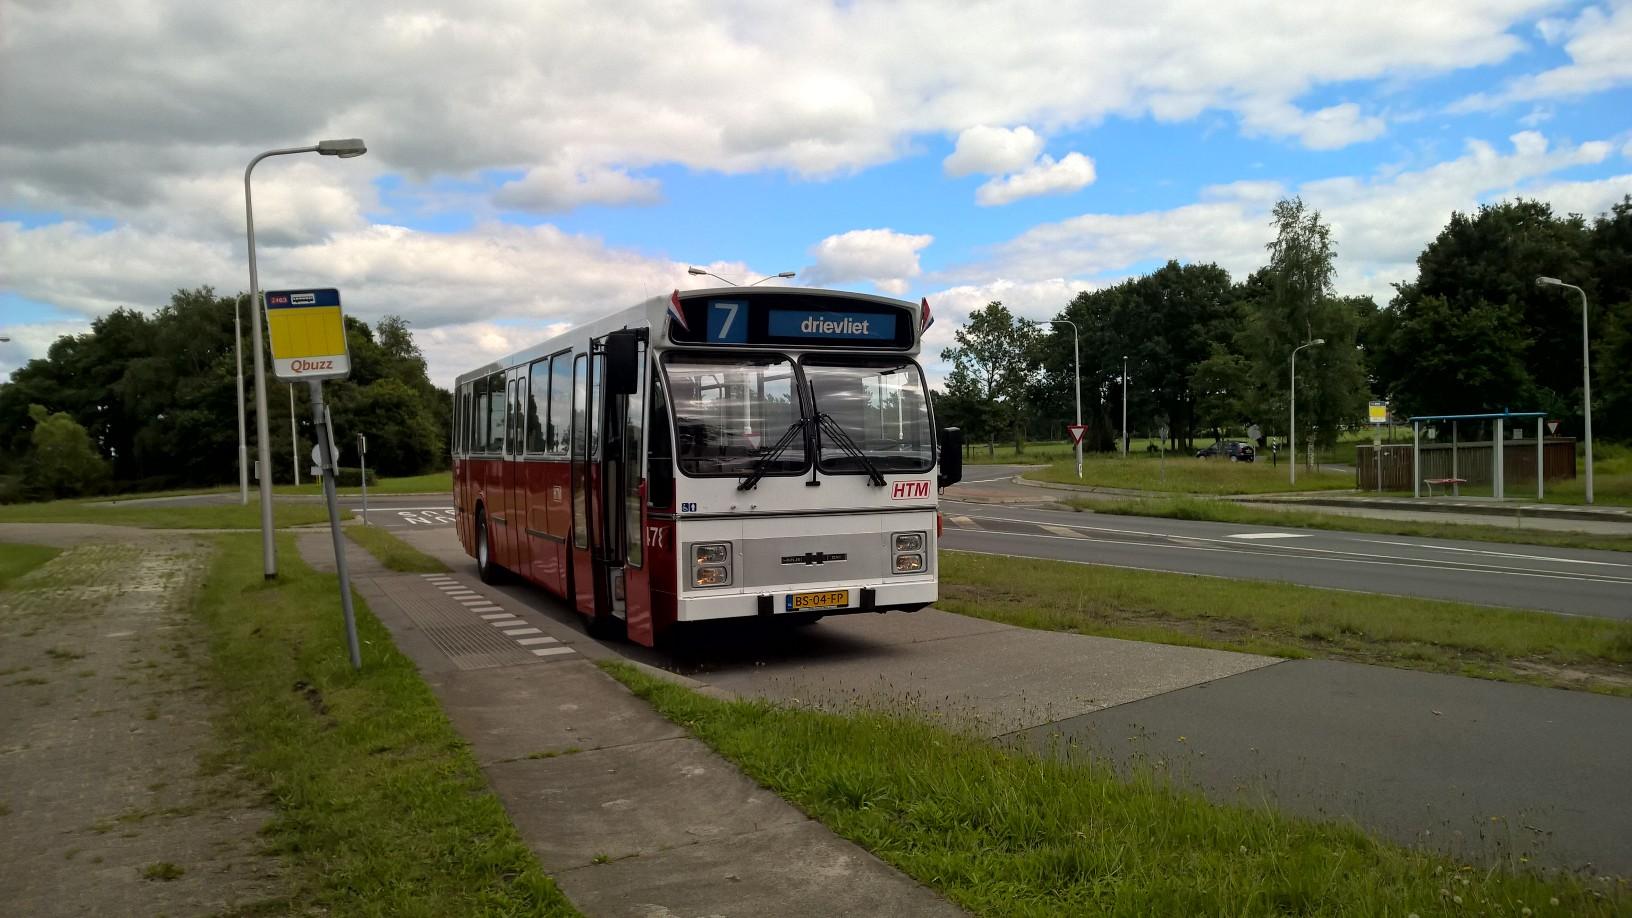 HTM 478